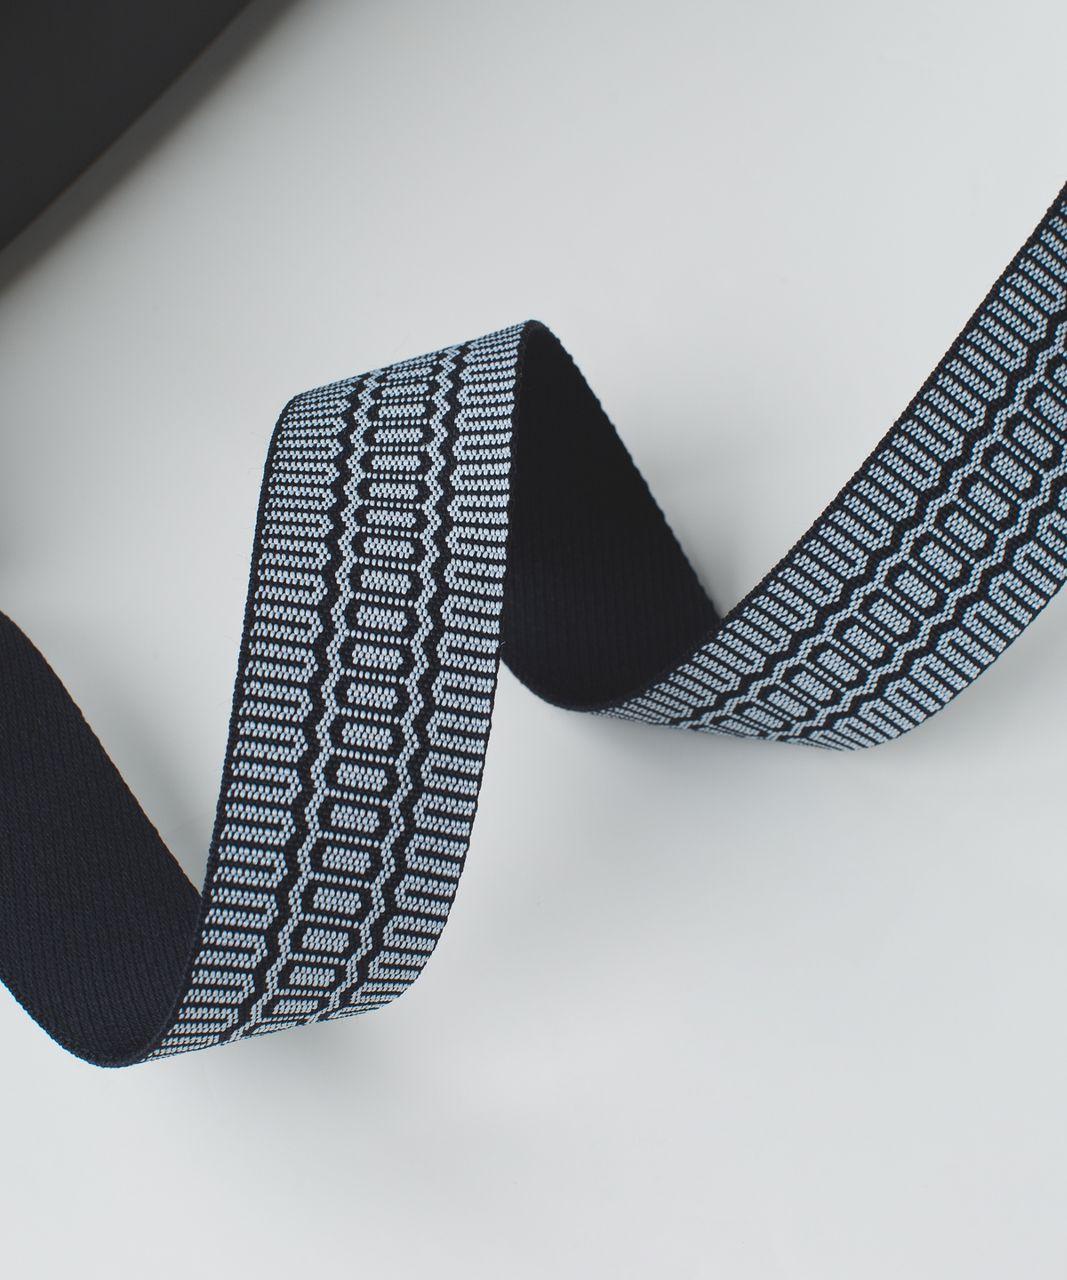 Lululemon Loop It Up Mat Strap - Naval Blue / Cool Breeze